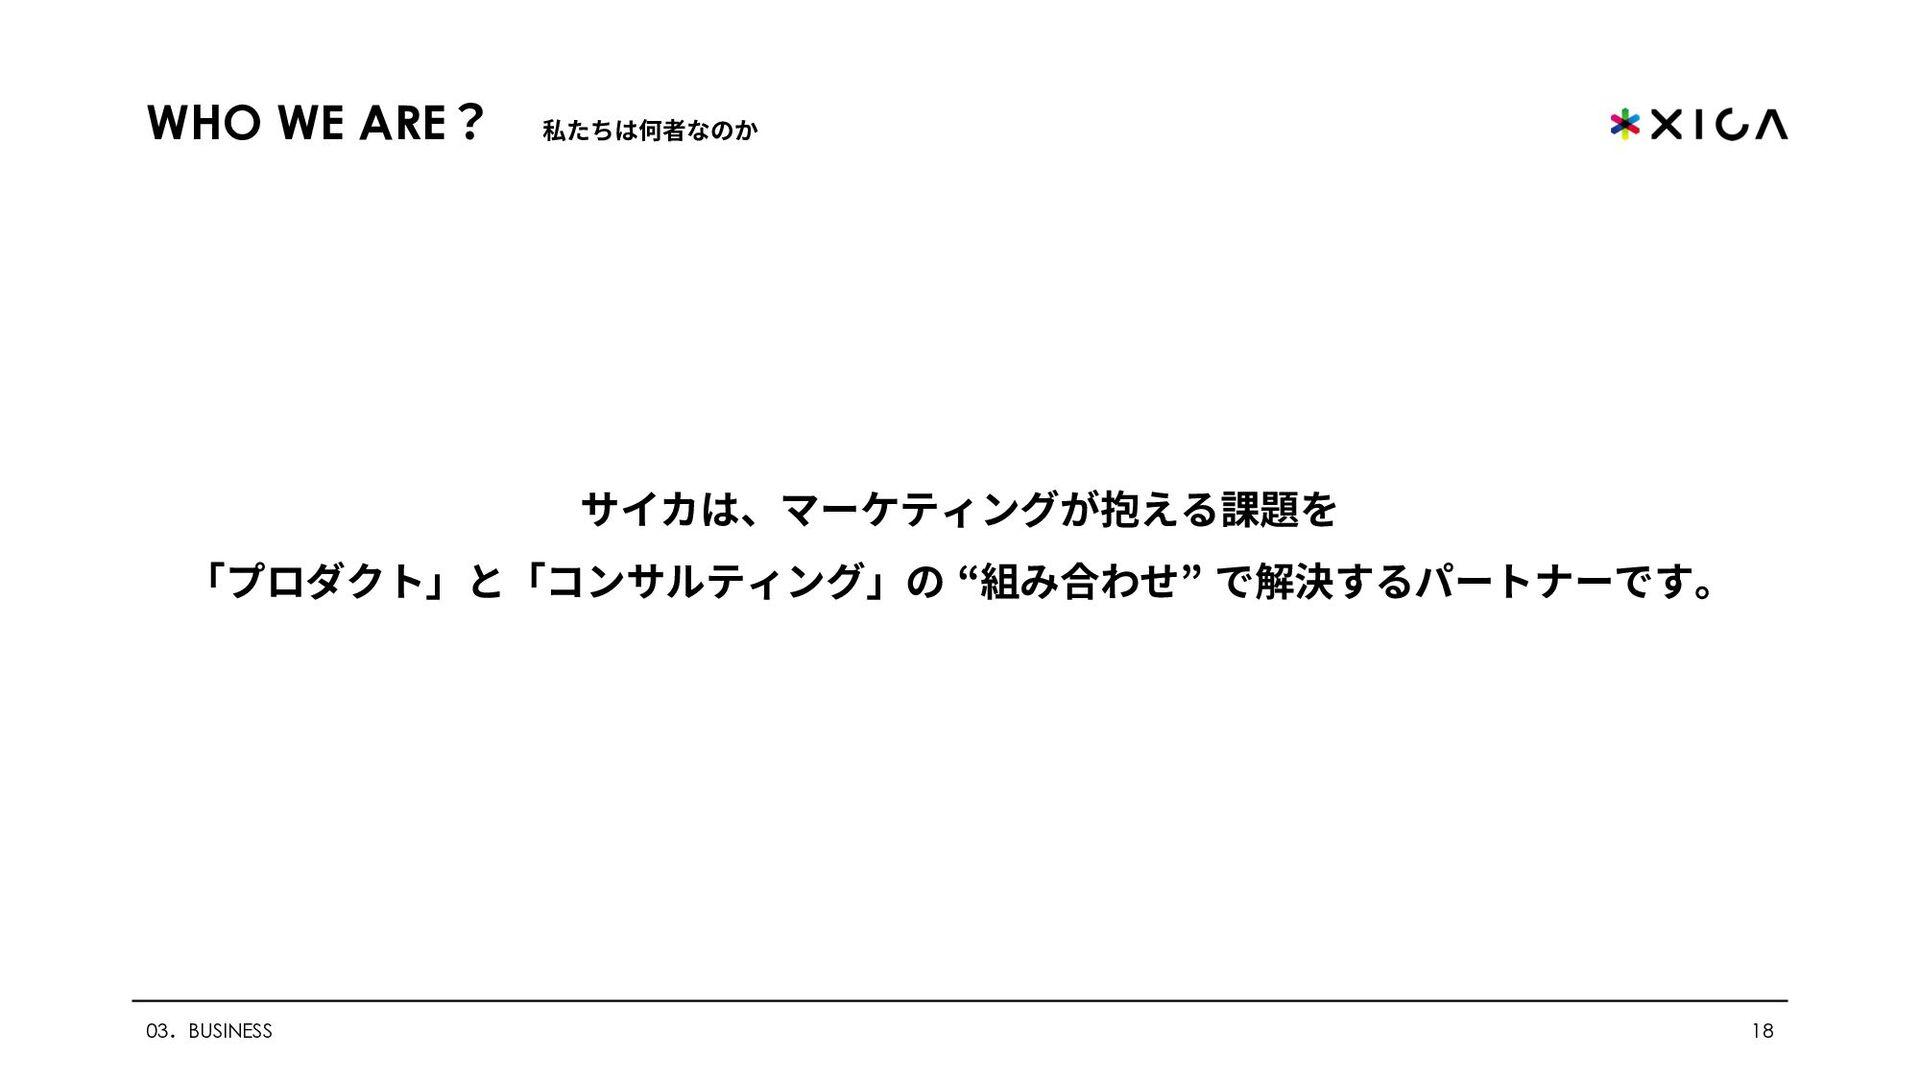 ADVA アドバとは︖ 18 03.BUSINESS ADVA(アドバ)は、 CMデータサイエ...